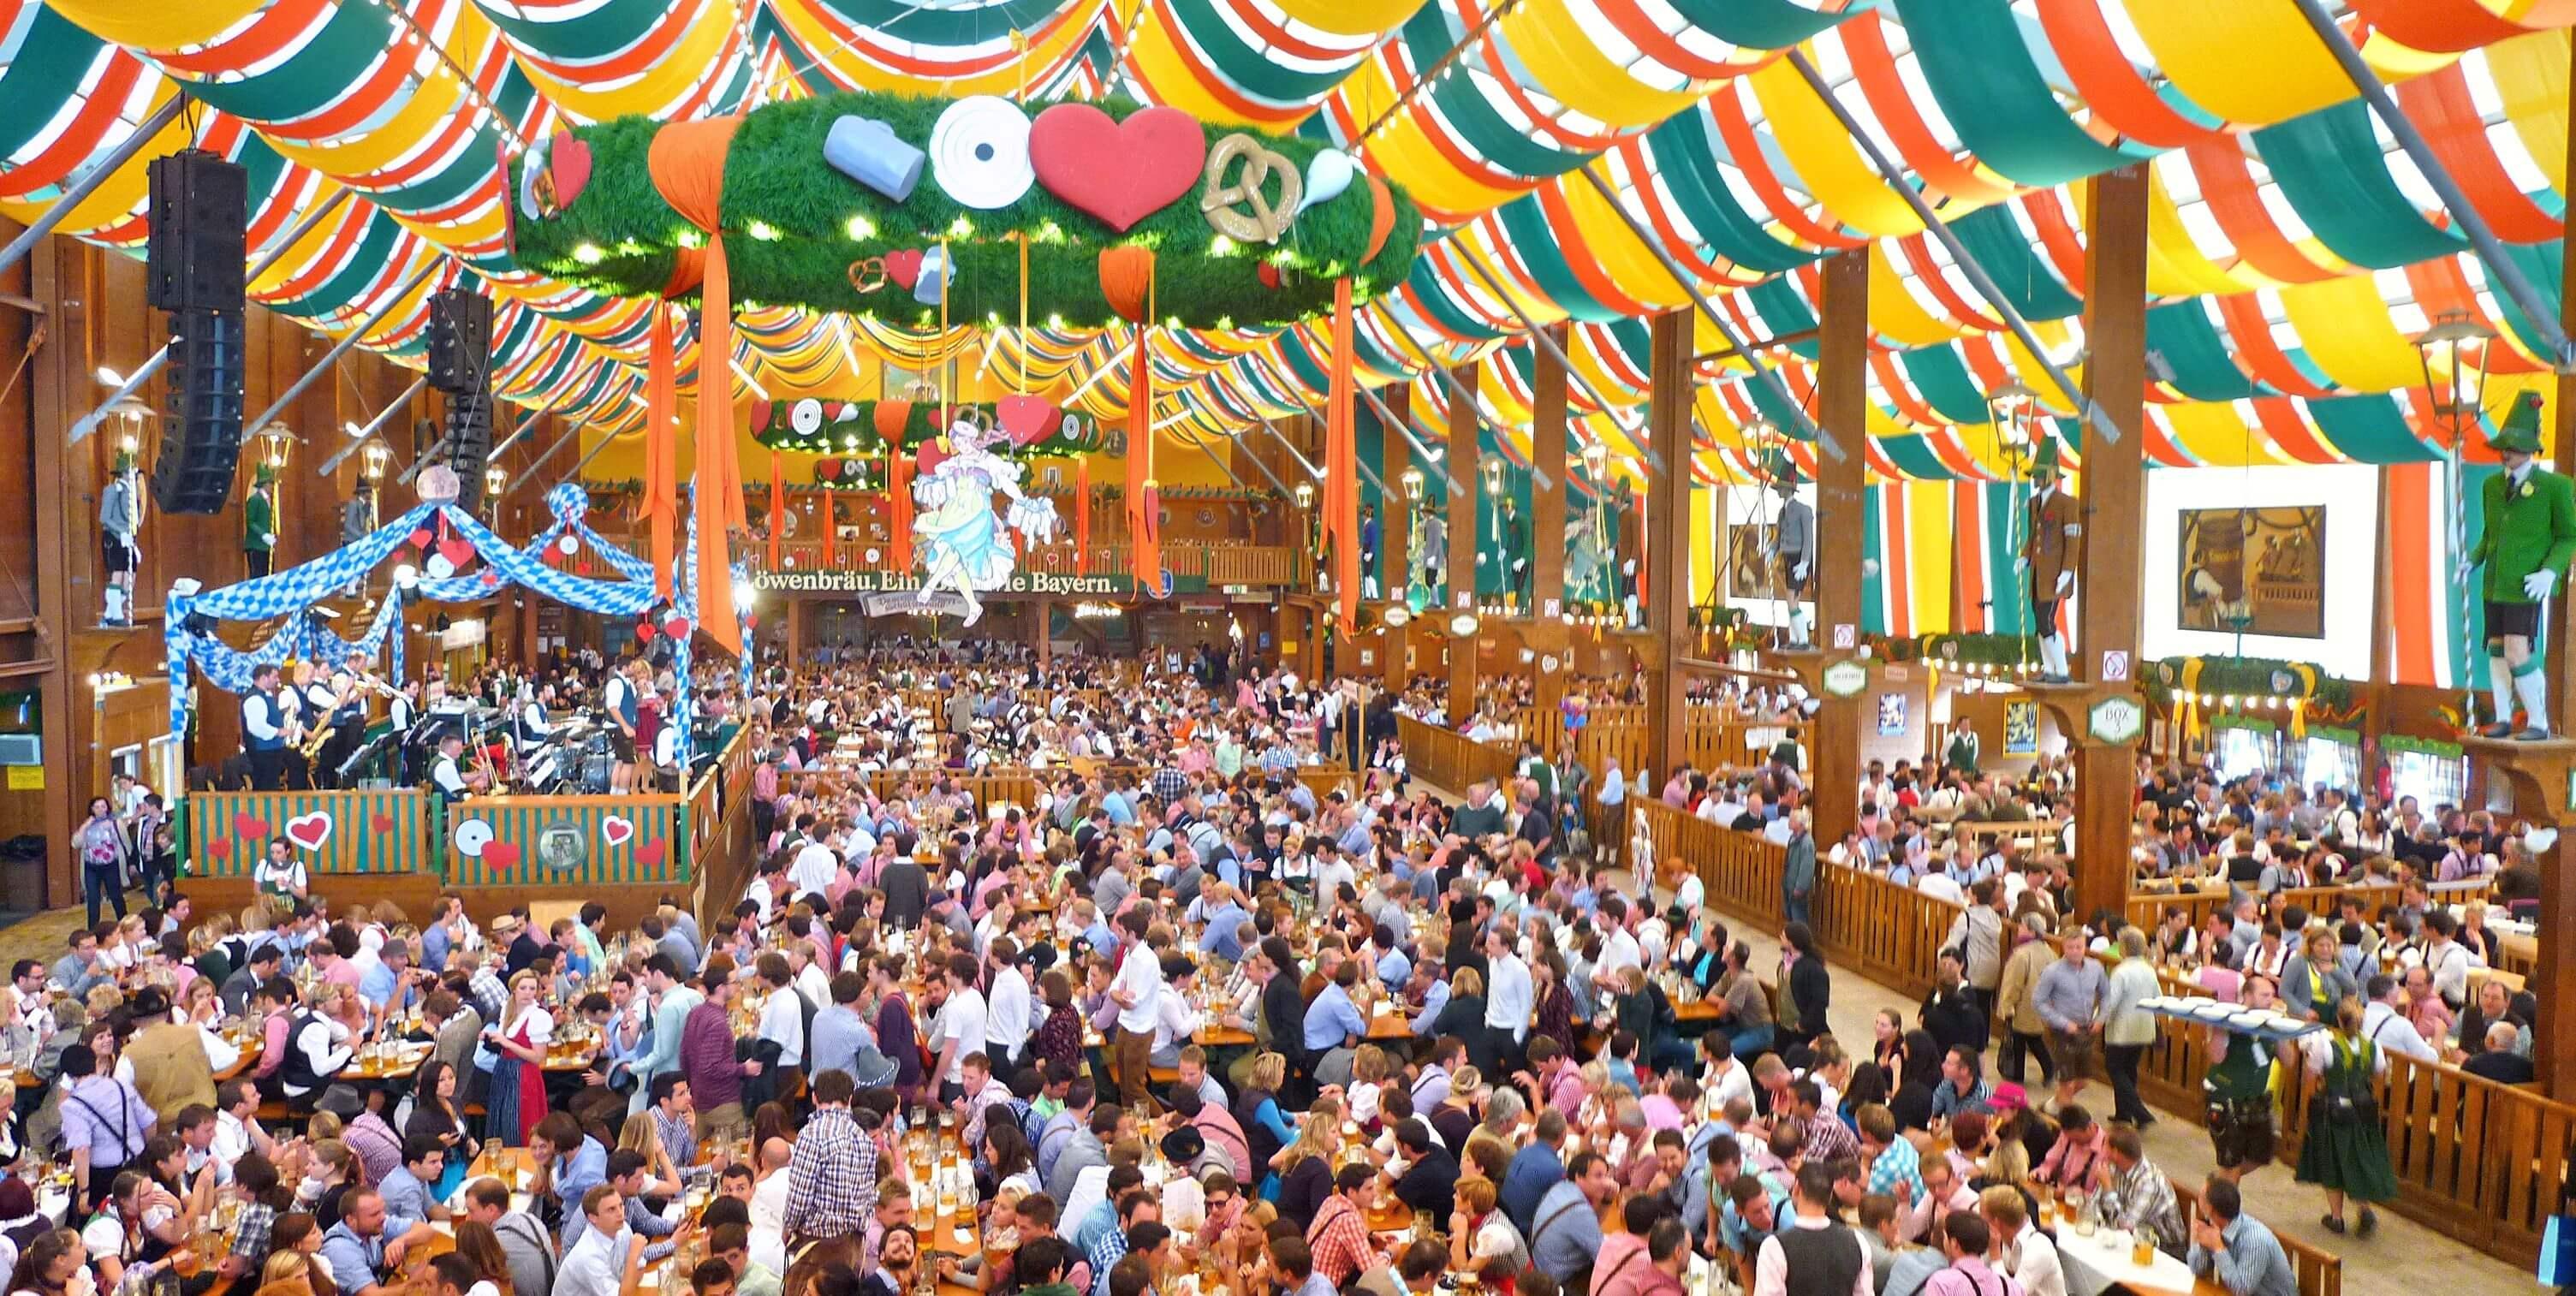 München_Schützen-Festzelt_Oktoberfest_2012_01